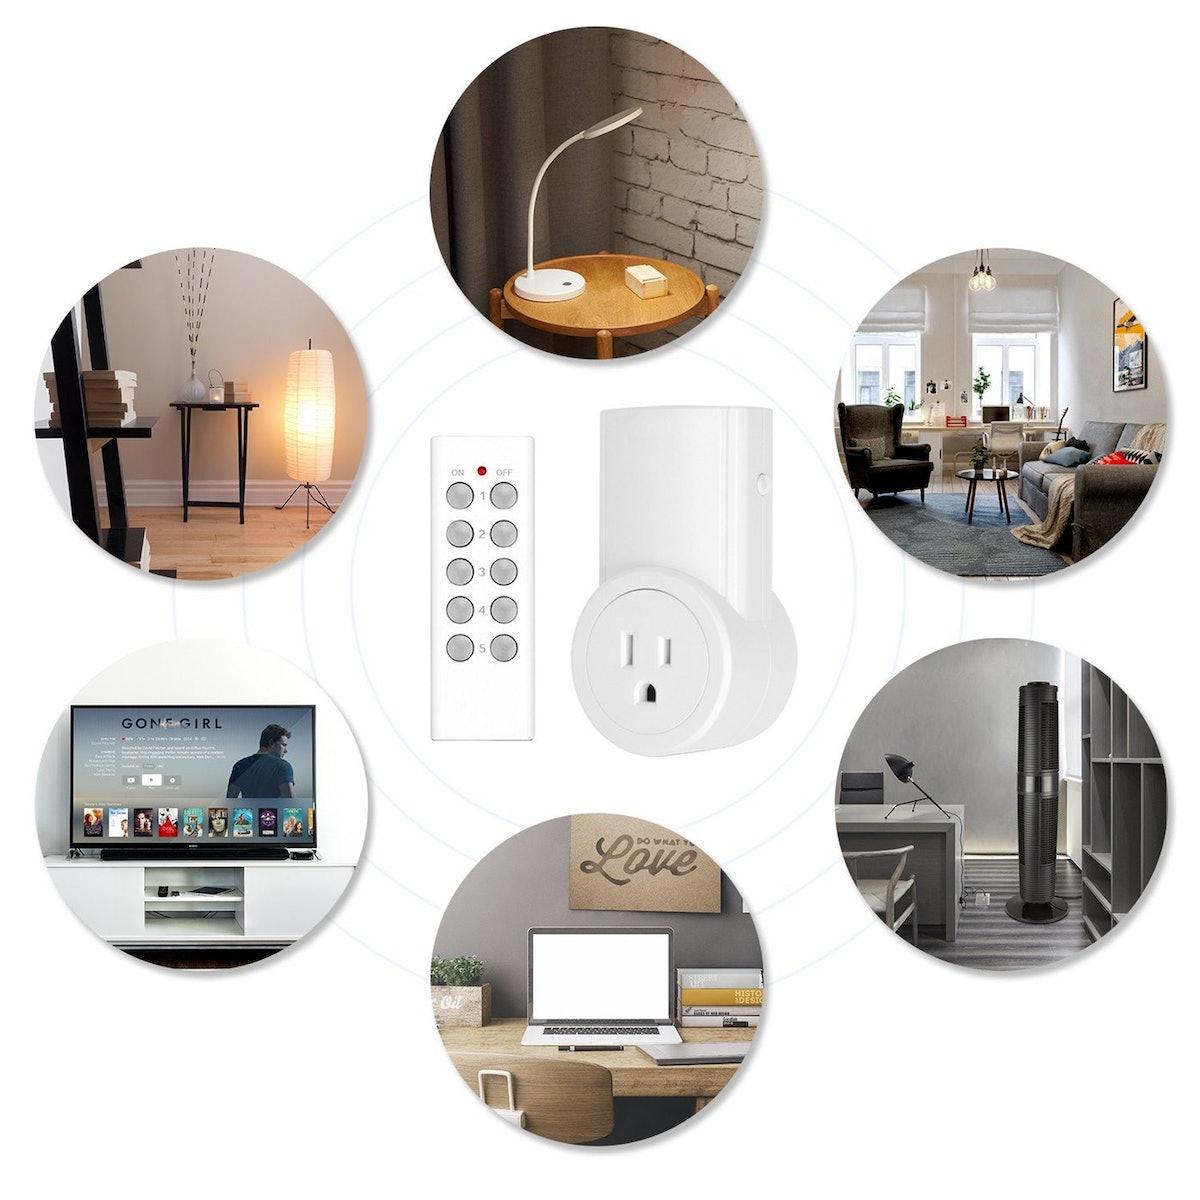 Etekcity Remote Control Outlet Kit